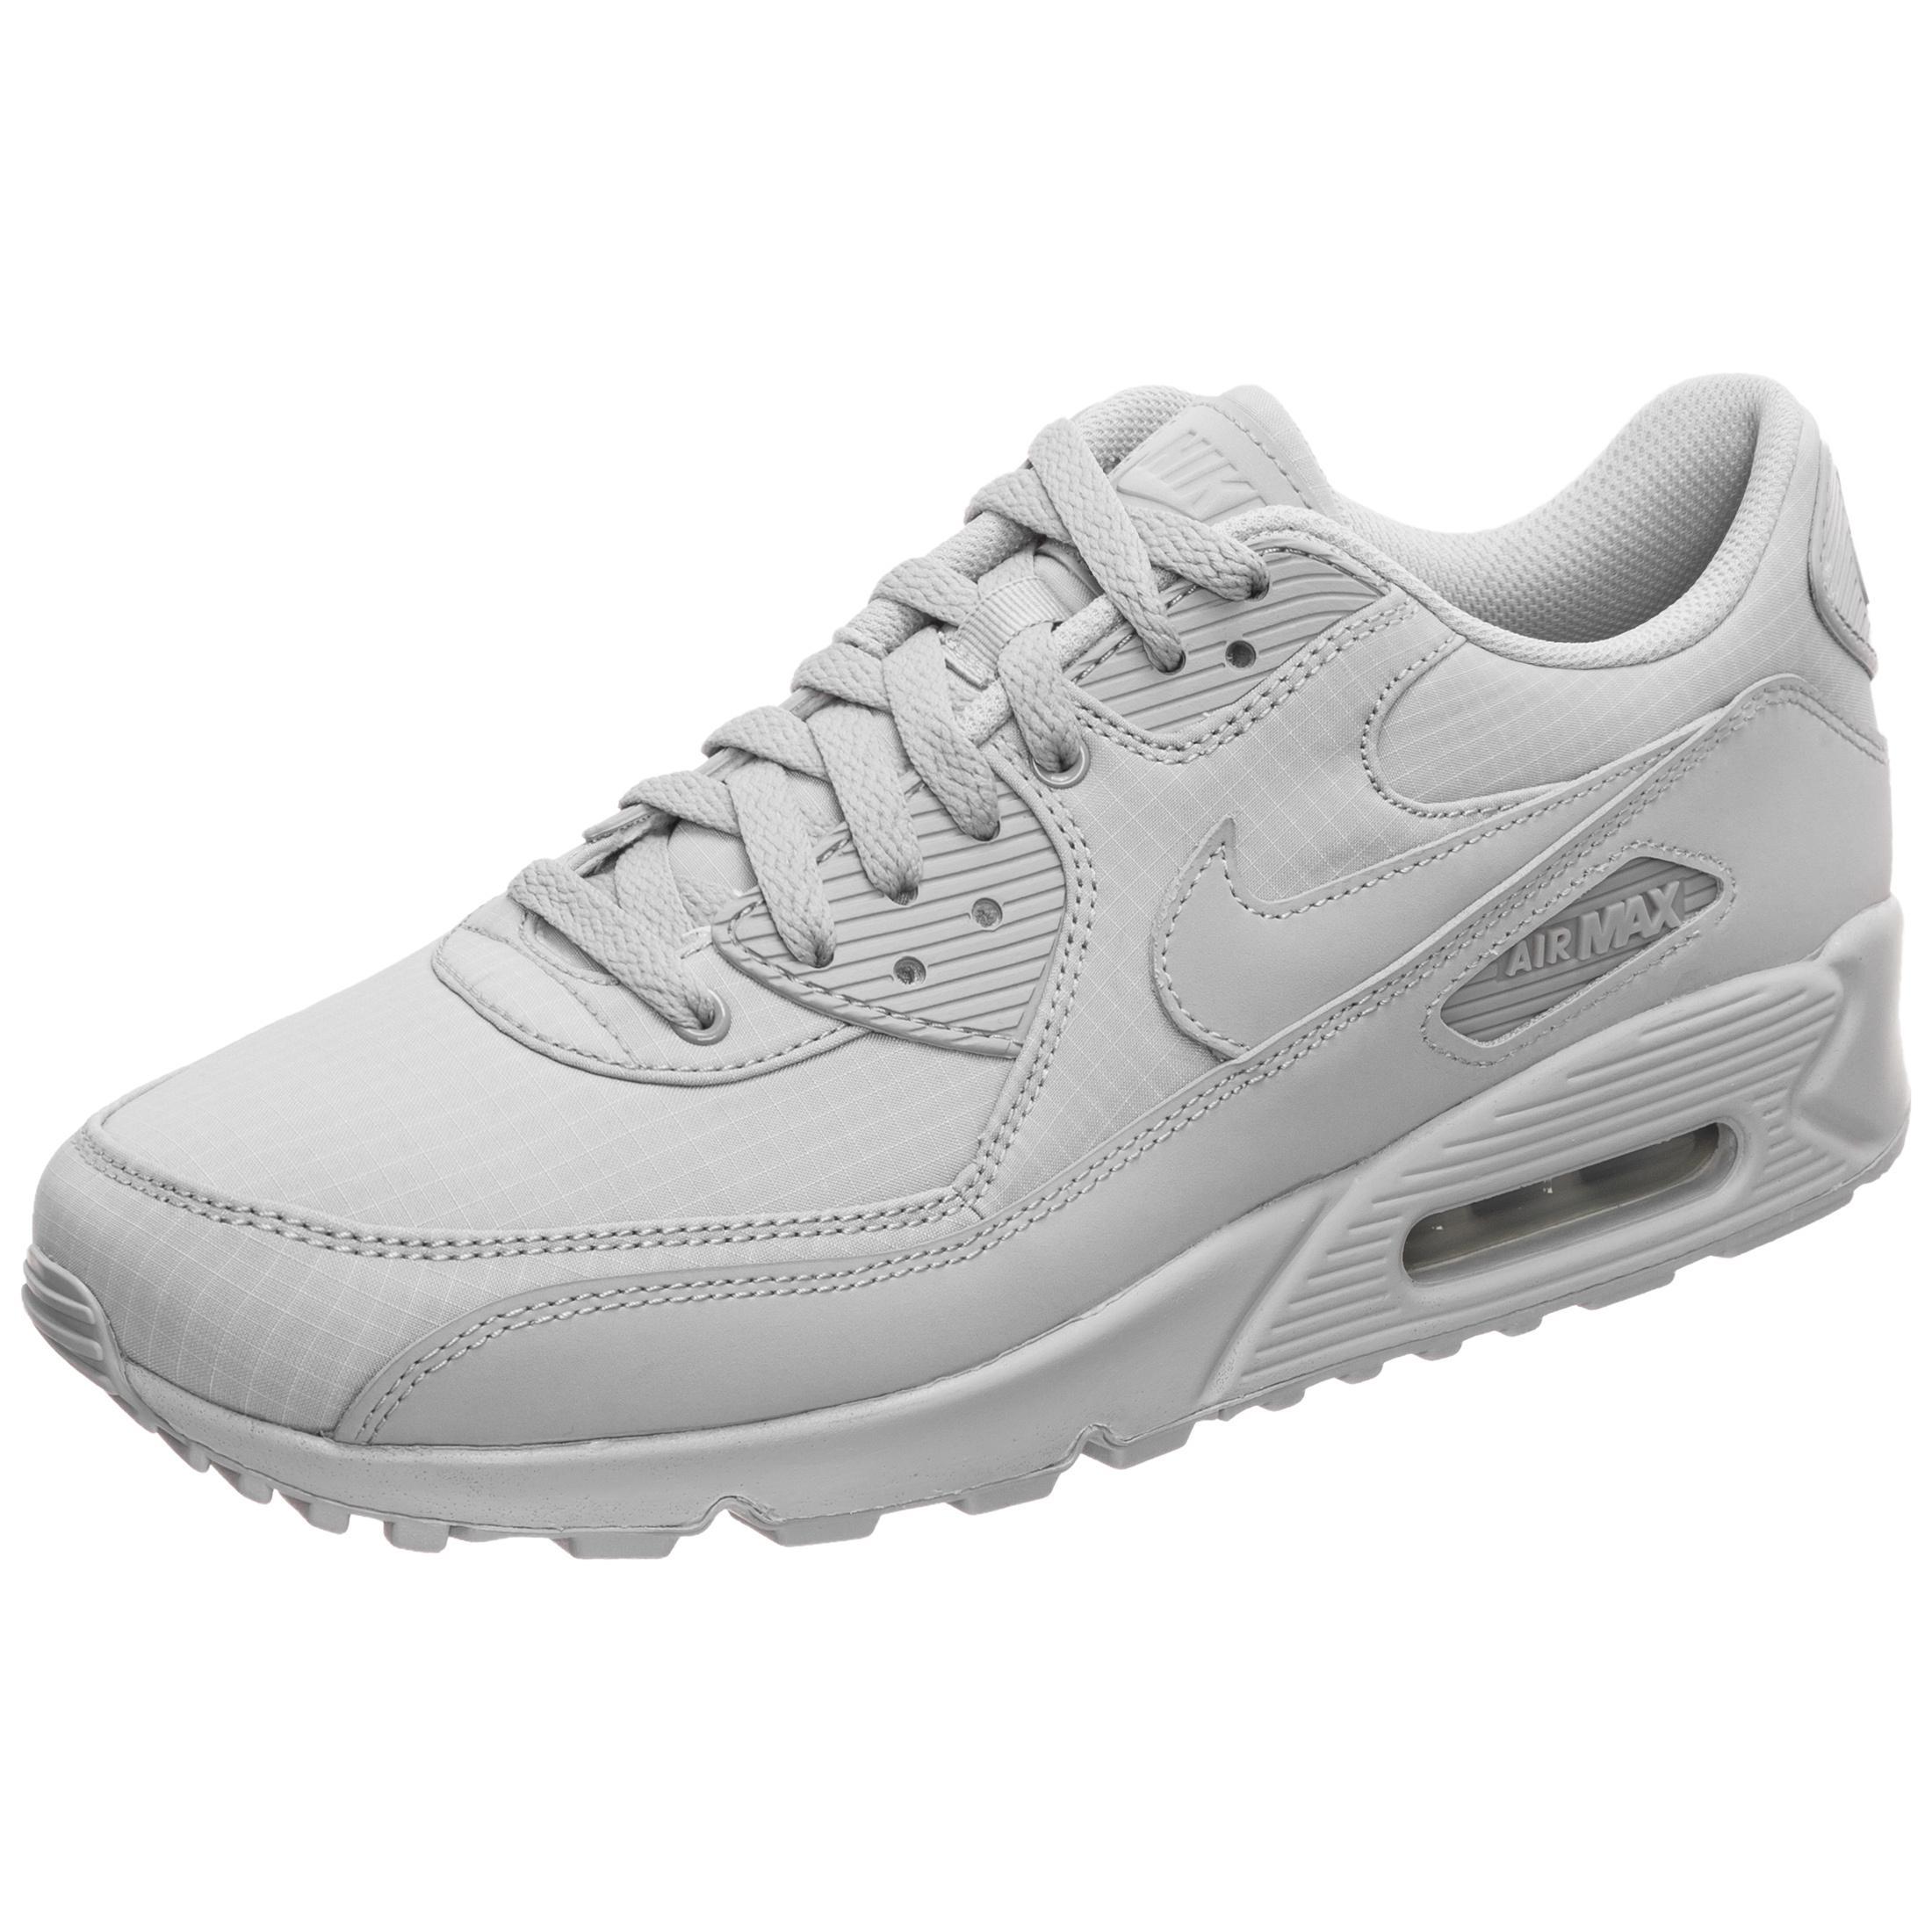 nike sportswear air max 90 essential sneaker für herren grau